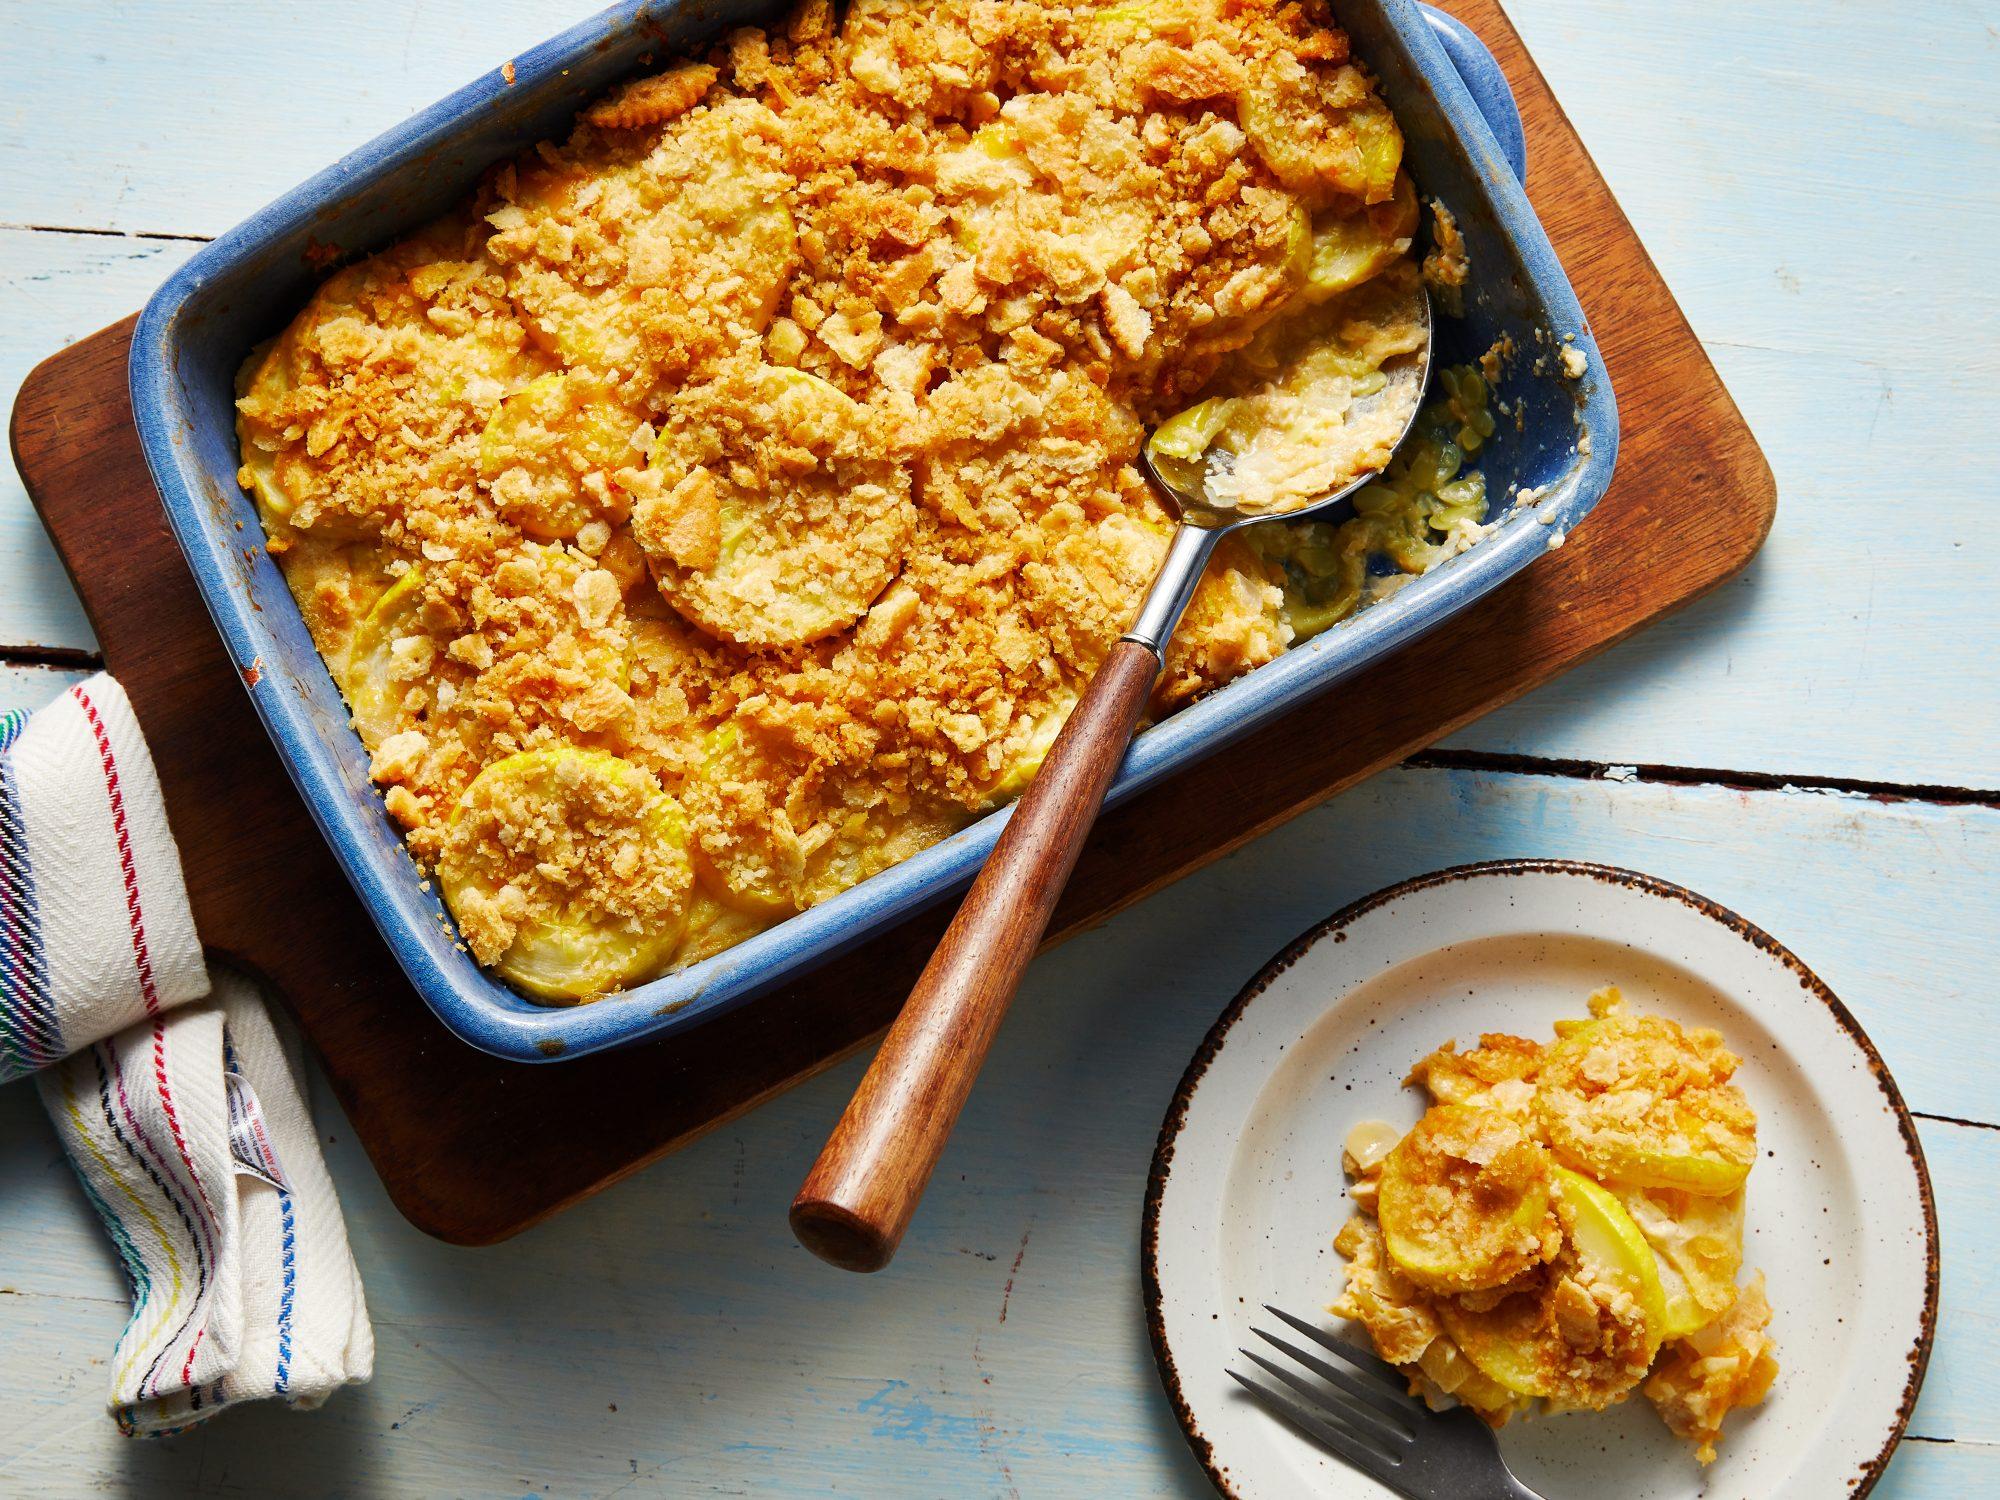 sl-squash-casserole-image-update